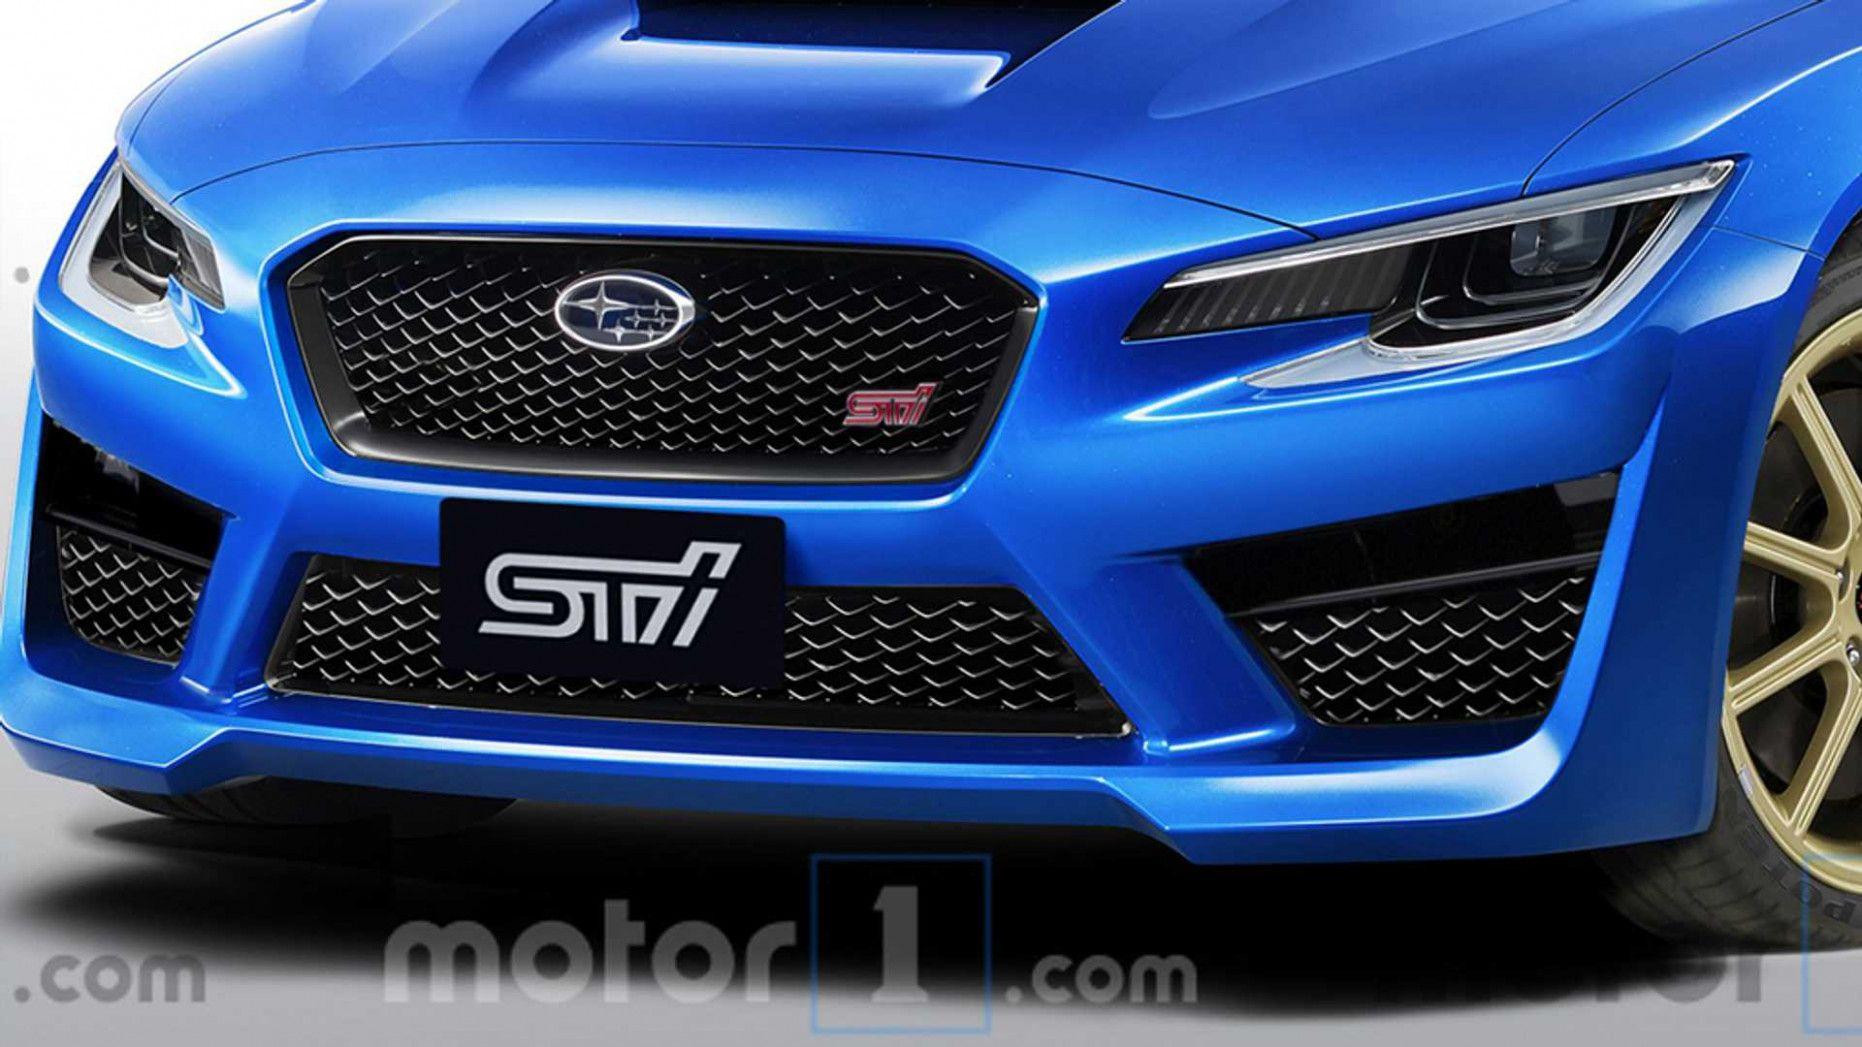 6 Picture Subaru Sti 2020 in 2020 Subaru impreza, Subaru